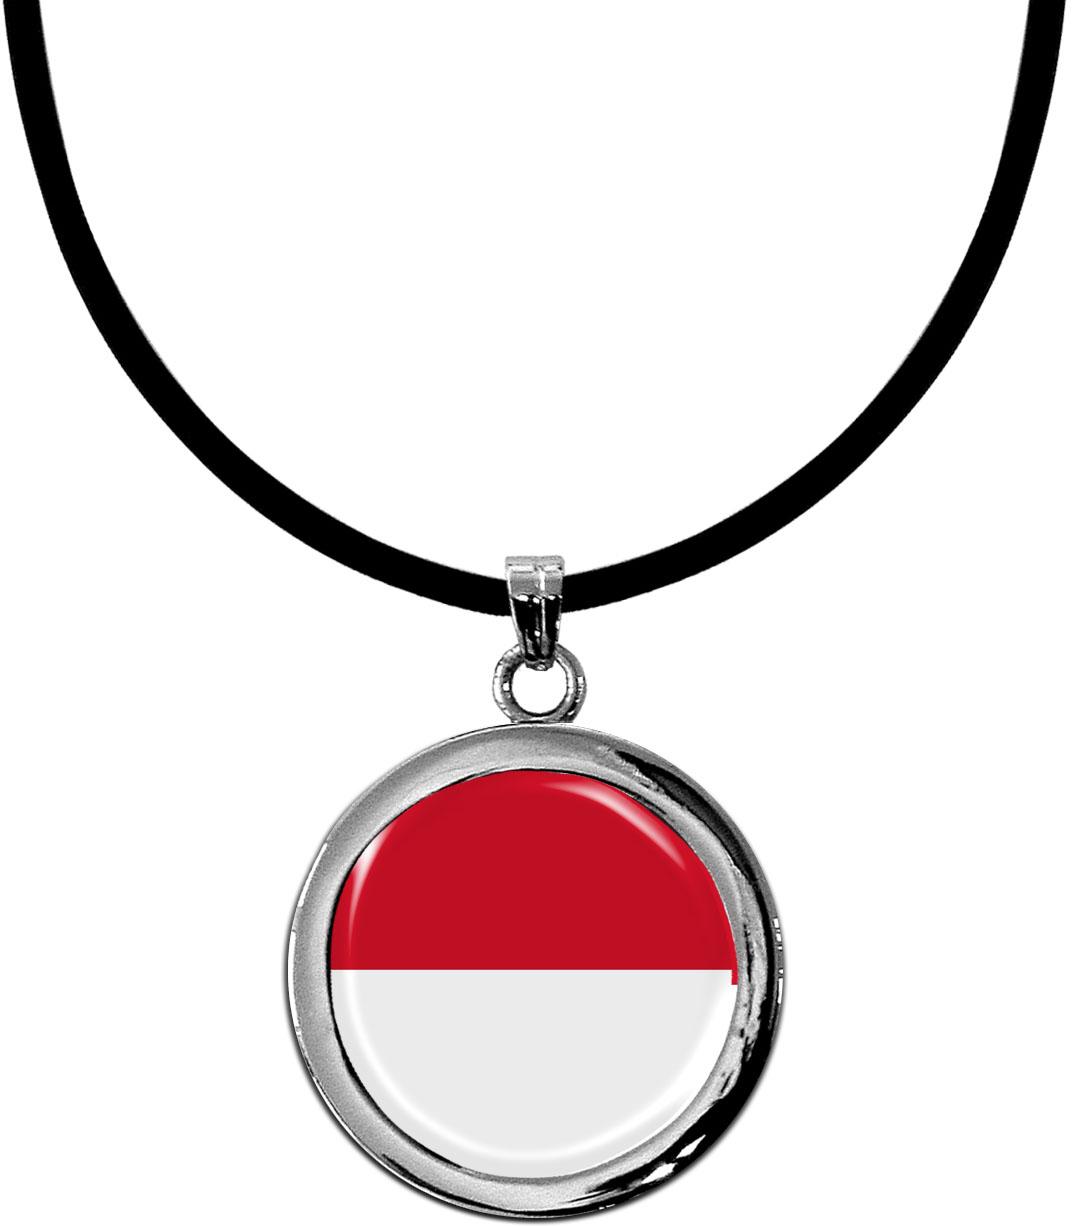 Kettenanhänger / Indonesien / Silikonband mit Silberverschluss